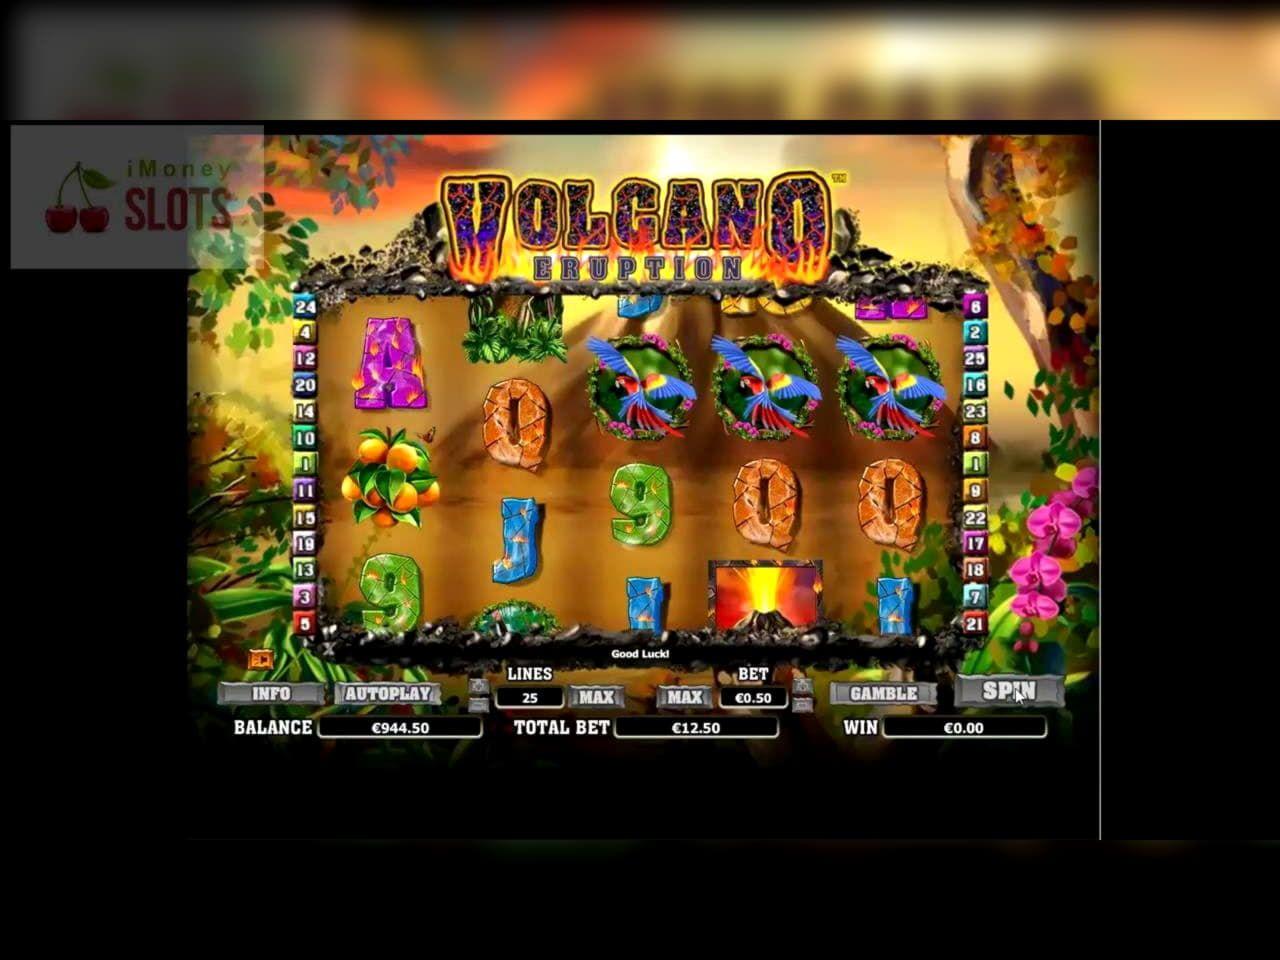 Euro 770 No Deposit Bonus At Betway Casino 66x Play Through Casino